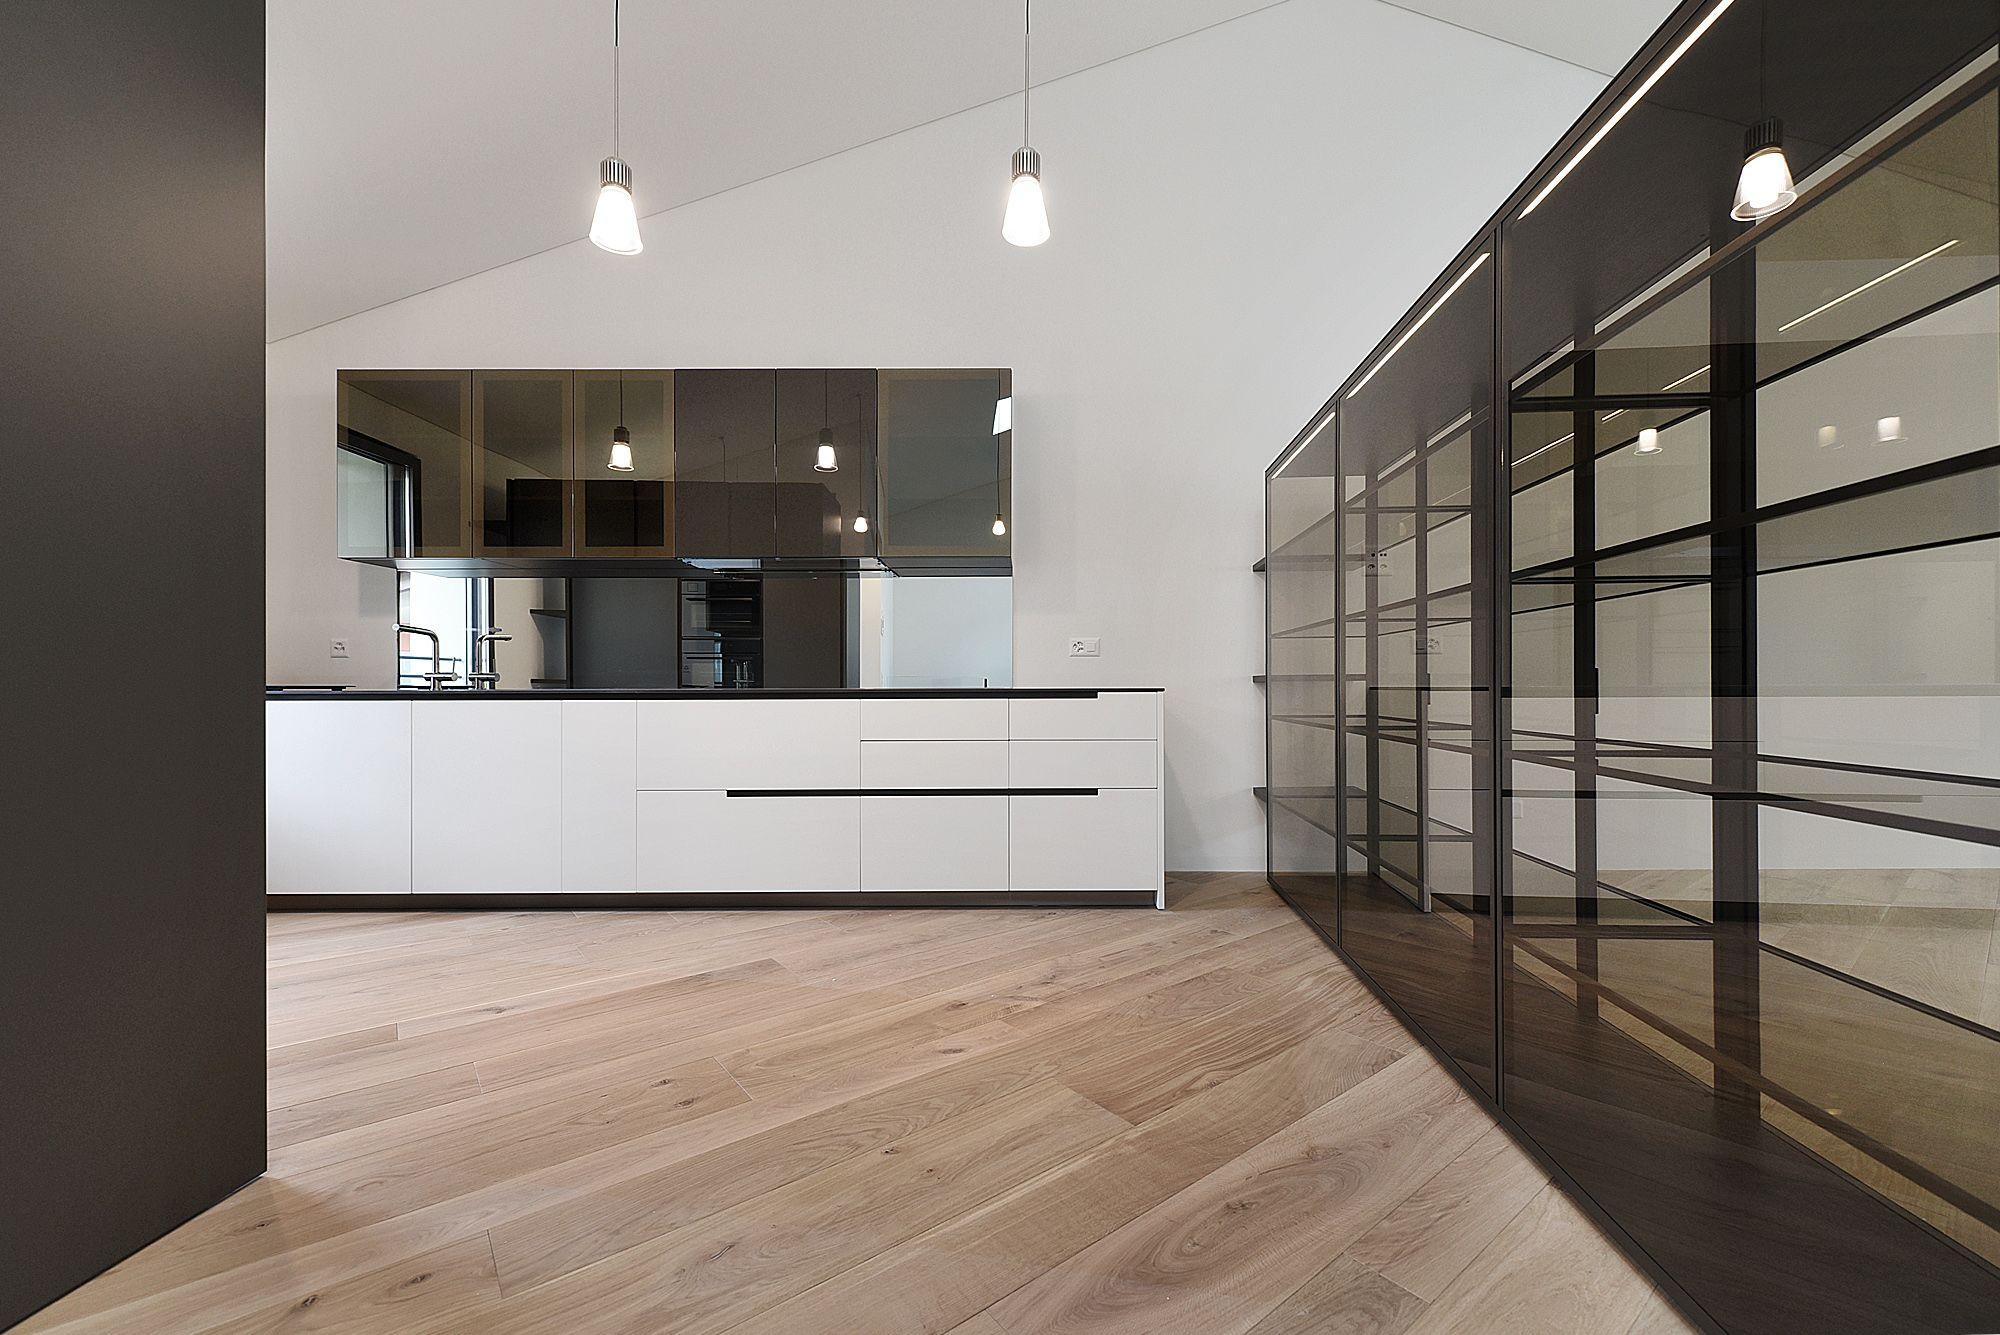 Progetto di arredamento, cucina Poliform, cucina design, cucina ...